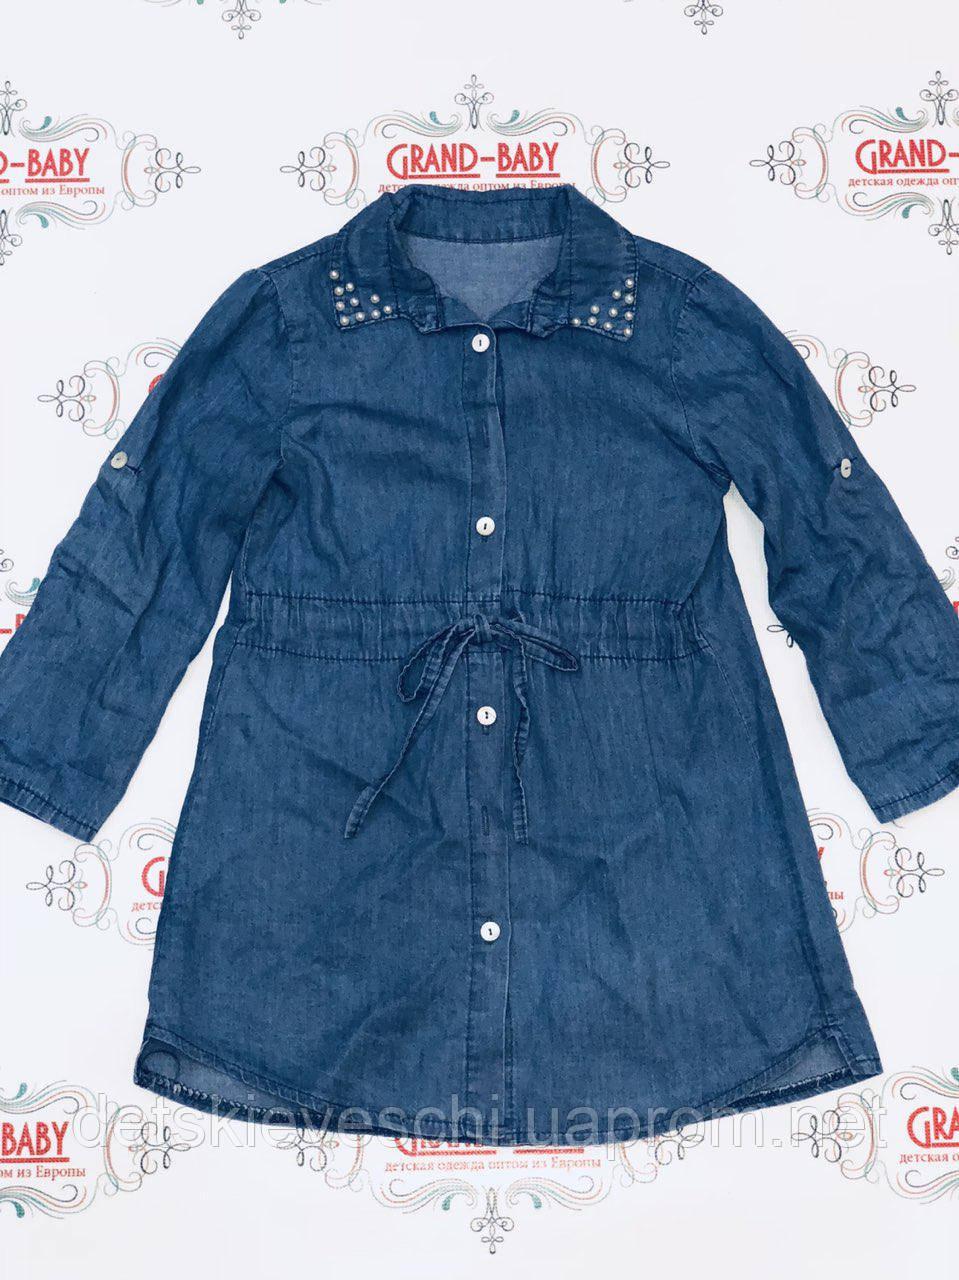 21c9787c102 Джинсовая рубашка туника для девочки Angelina.Италия  продажа